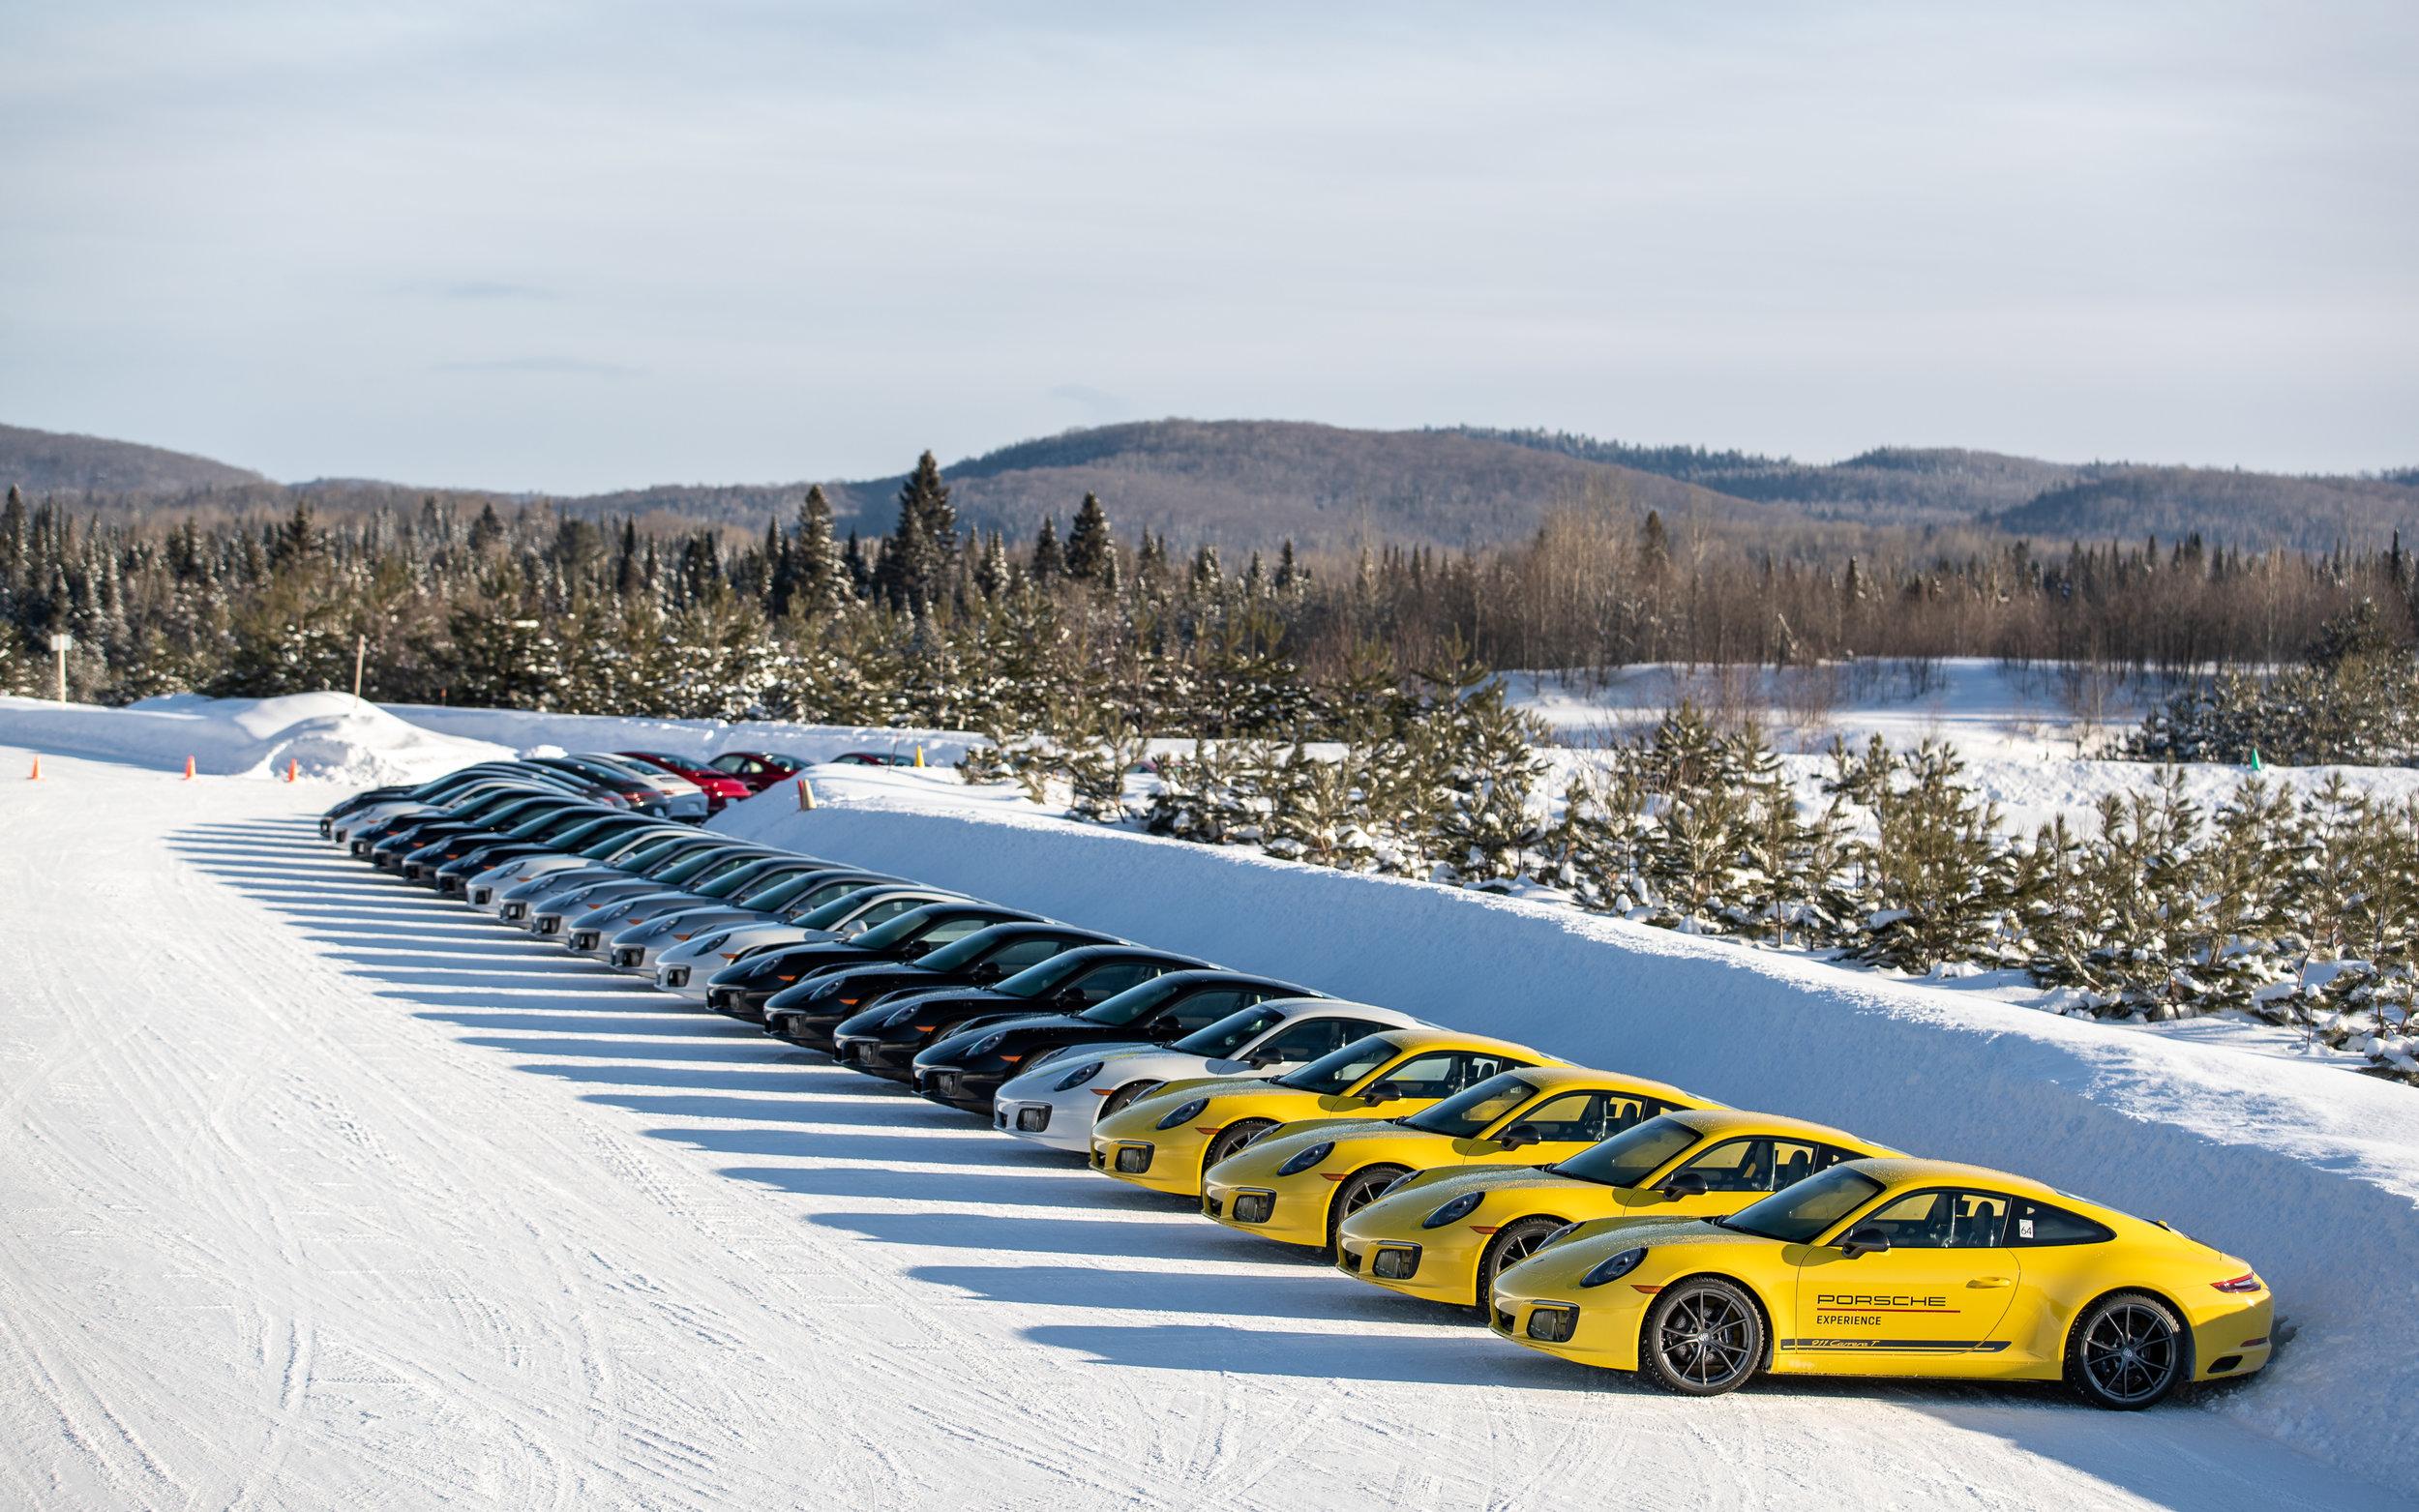 Porsche-Ice-Experience-Canada-Media-1.jpg